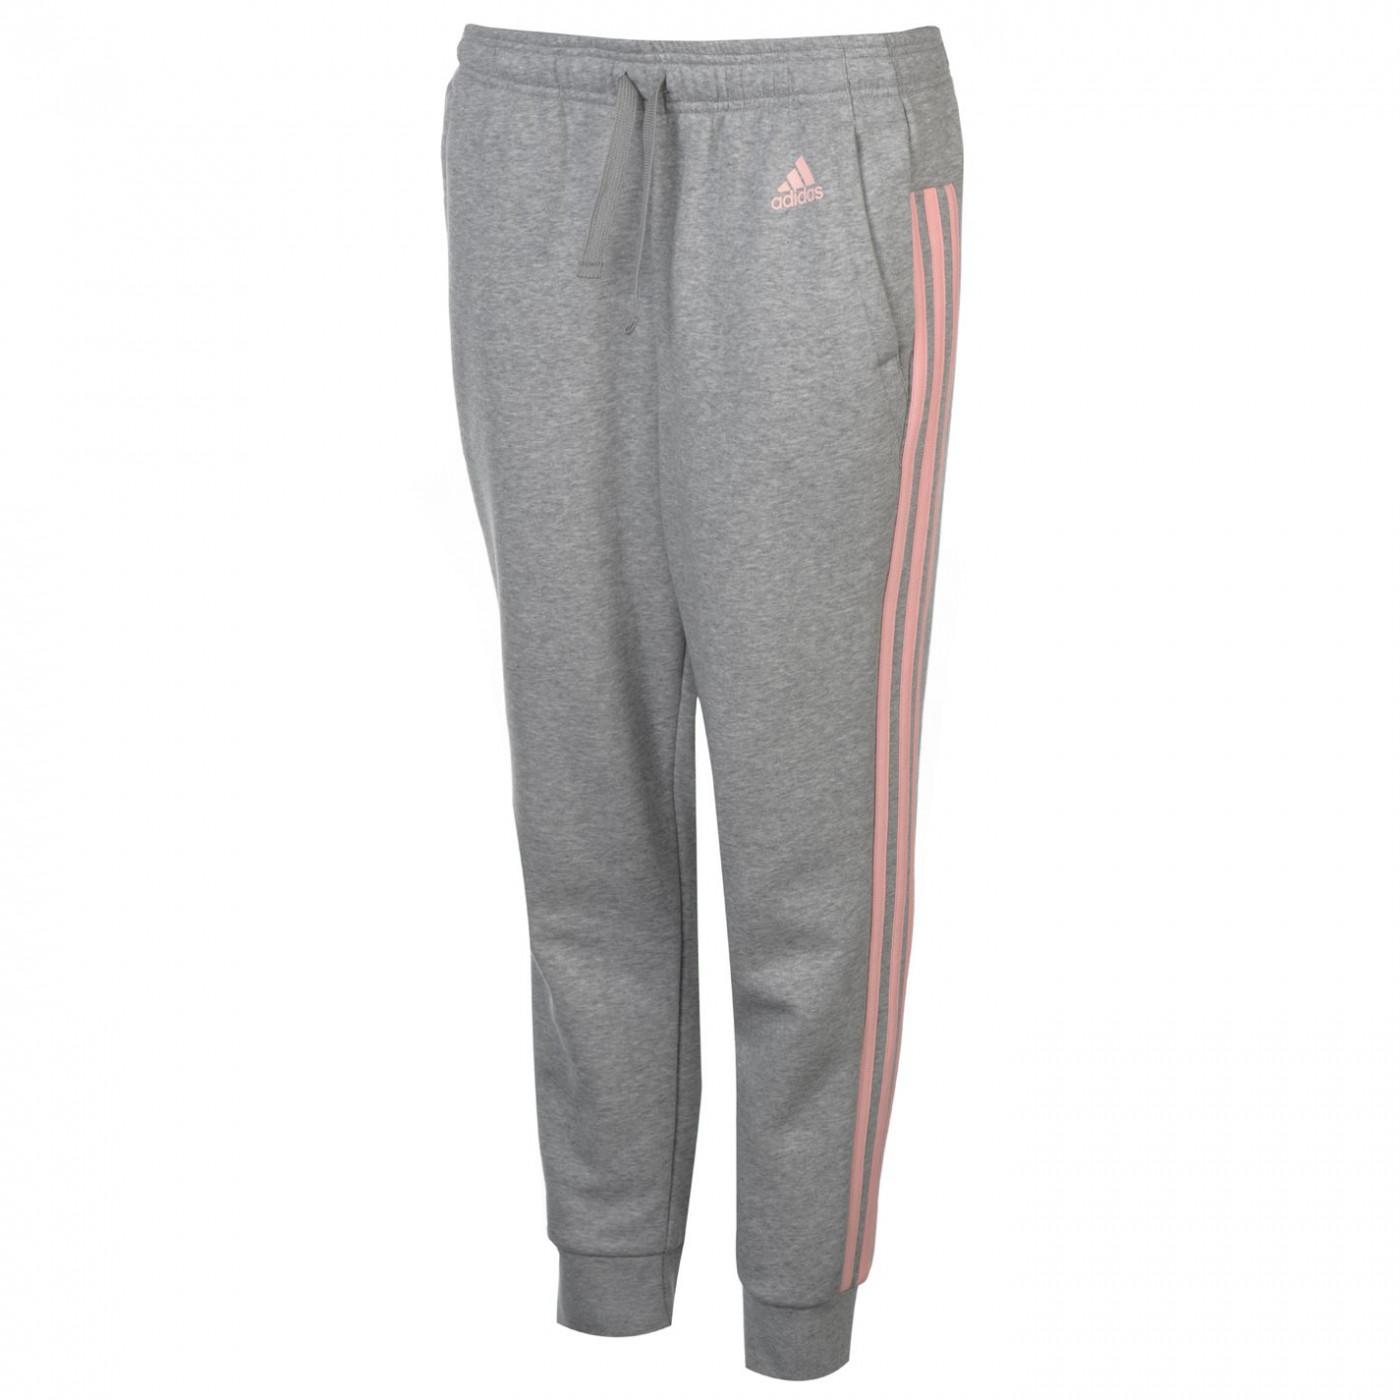 Adidas Essential 3 Stripe Closed Hem Pants Ladies